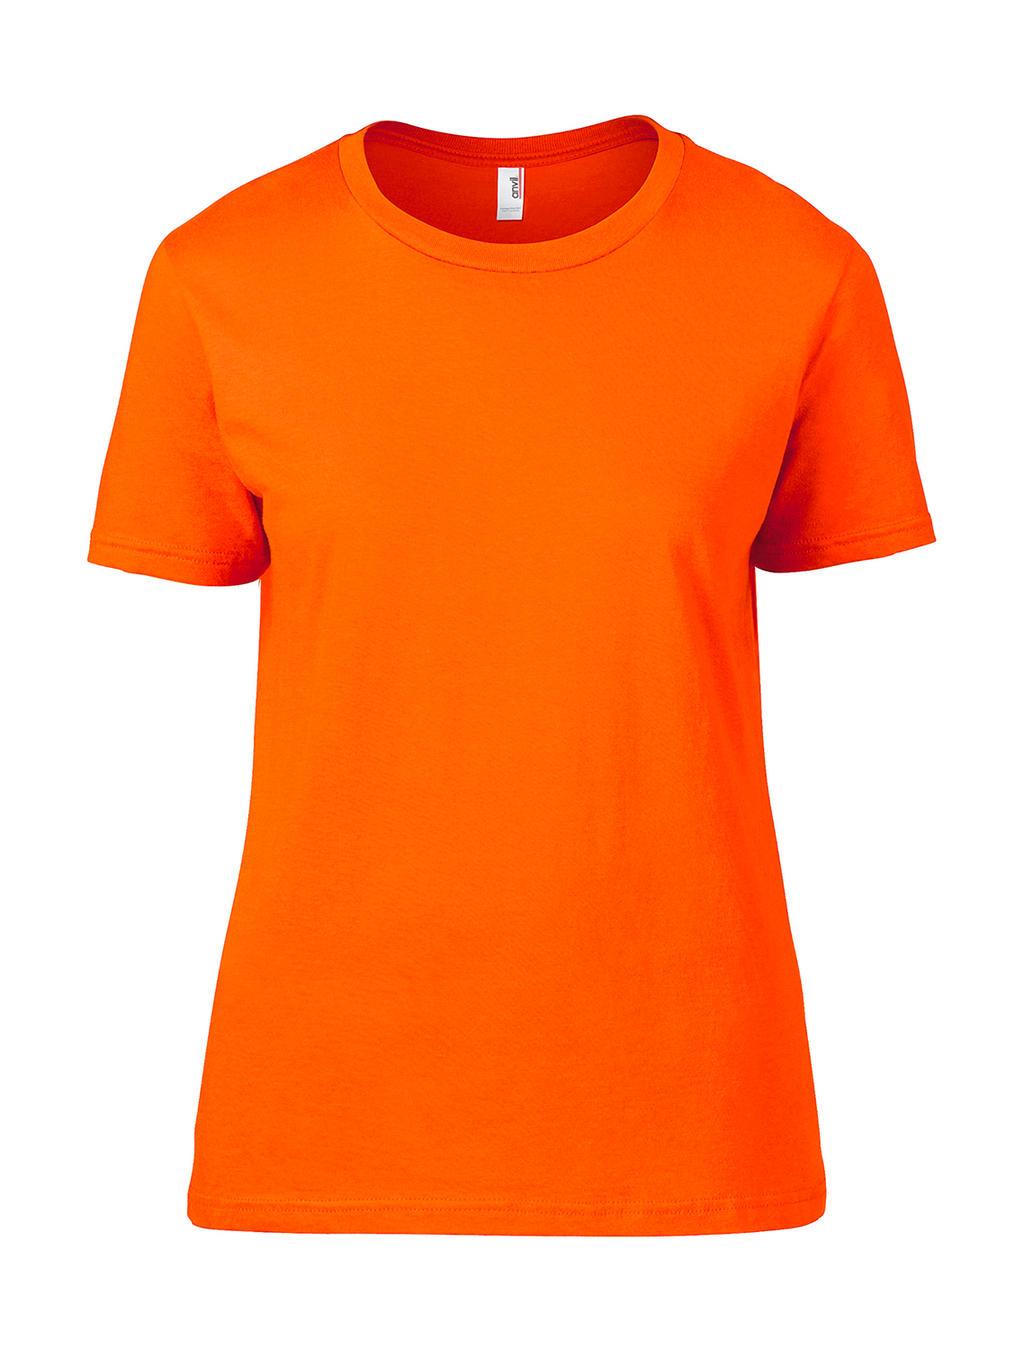 damen neon t shirt neon orange xl selber gestalten. Black Bedroom Furniture Sets. Home Design Ideas